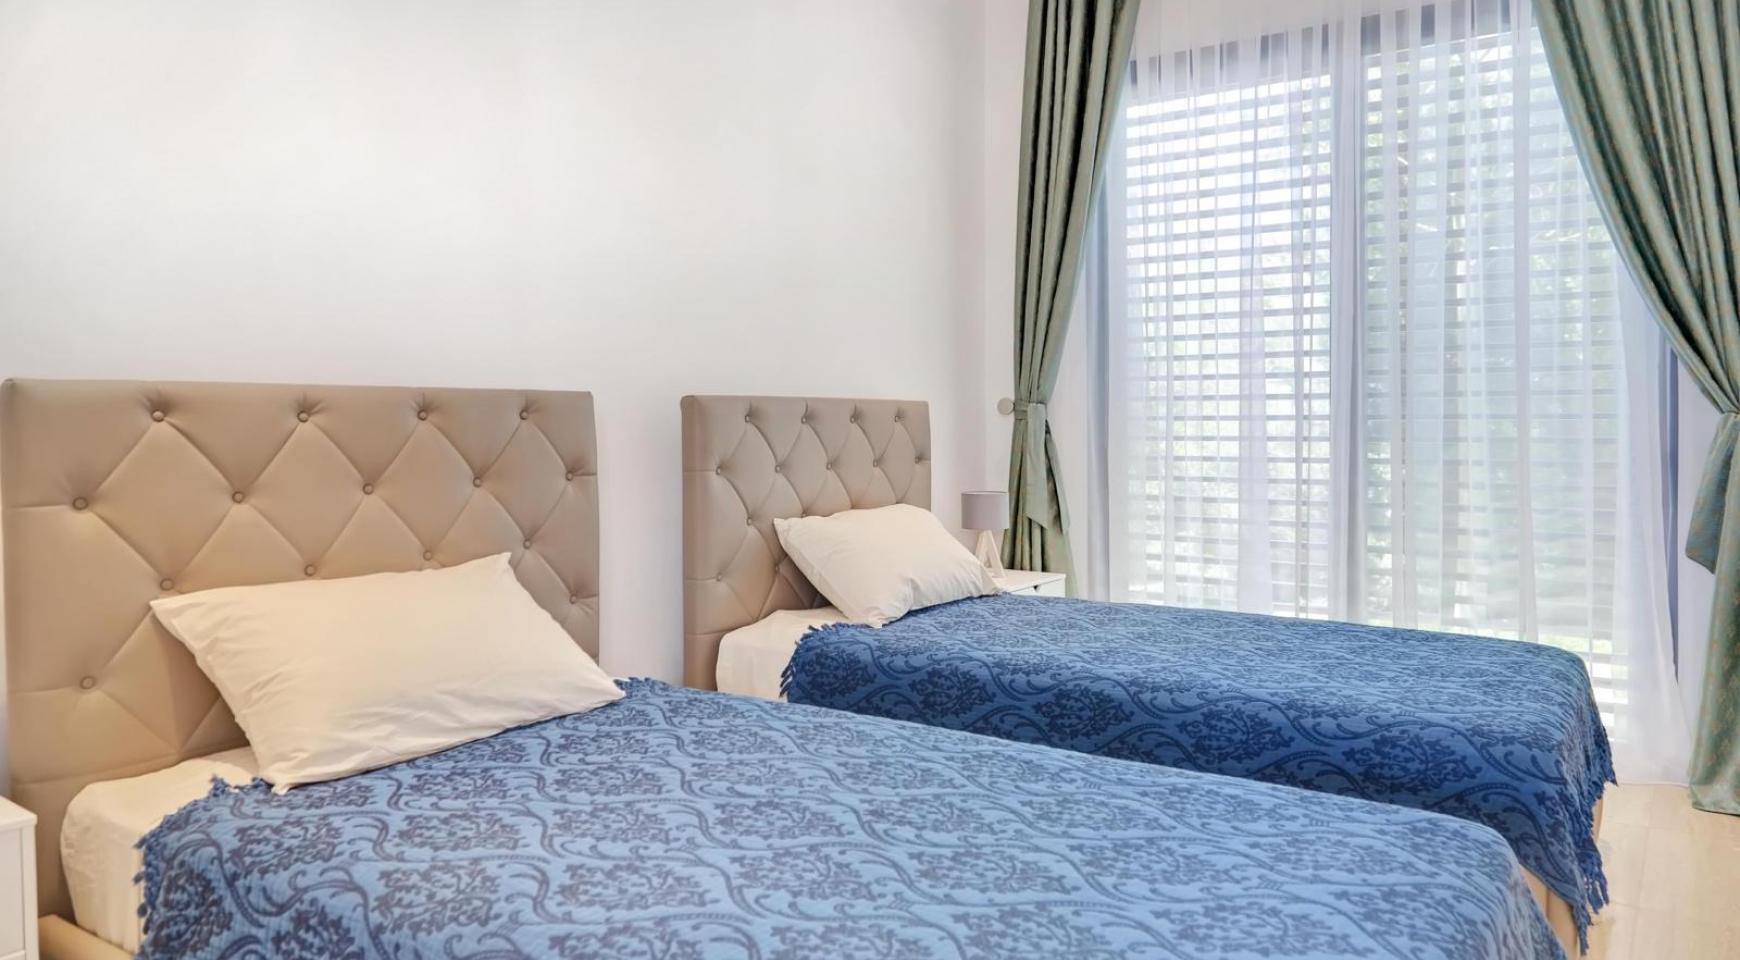 New Luxurious 4 Bedroom Villa in the Tourist Area - 36